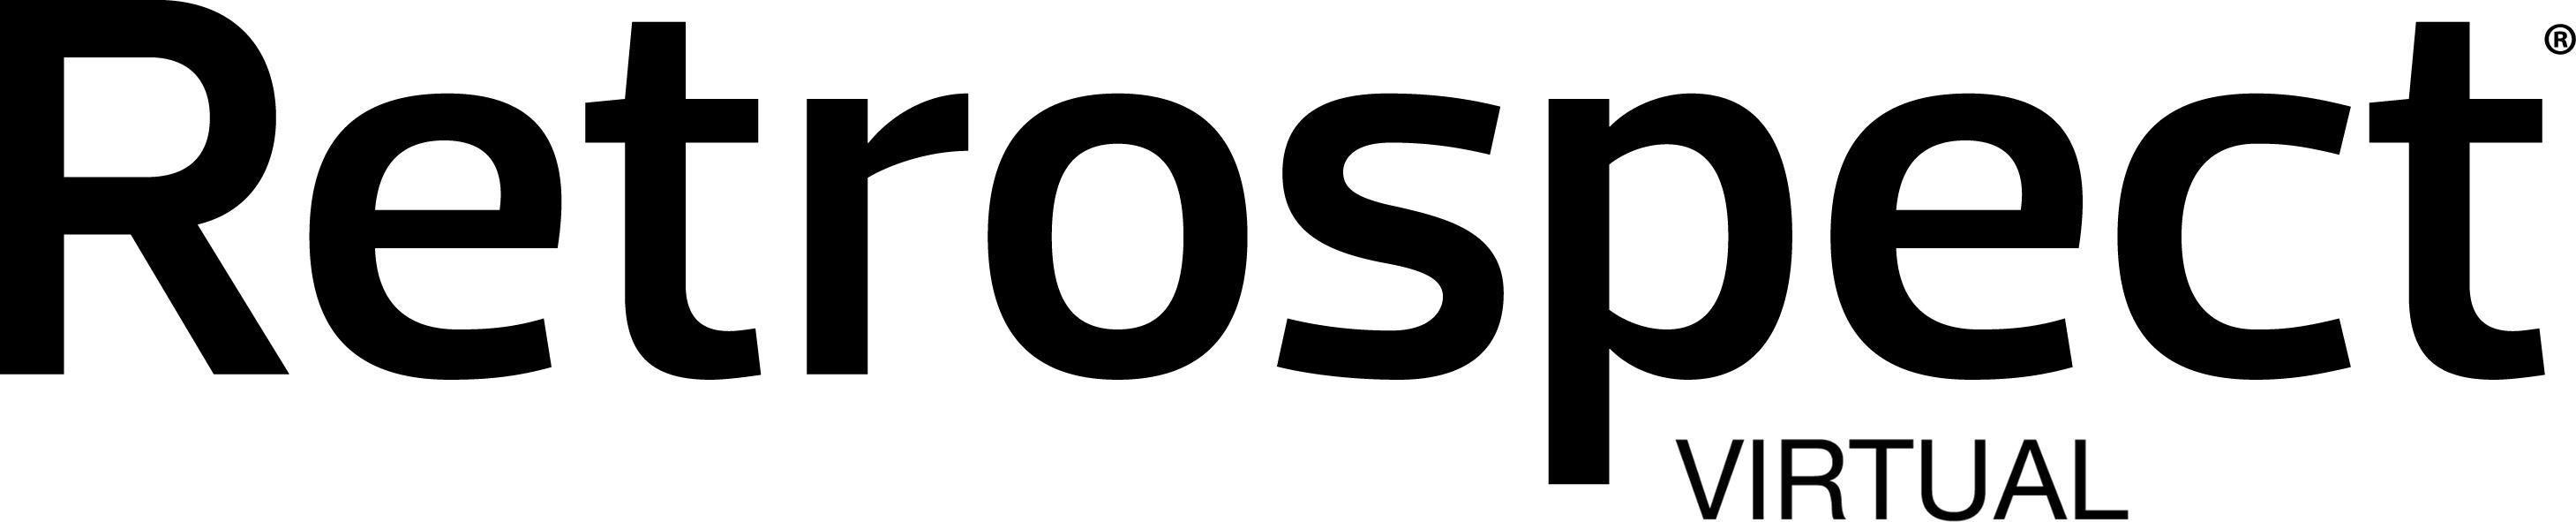 Retrospect product logo virtual